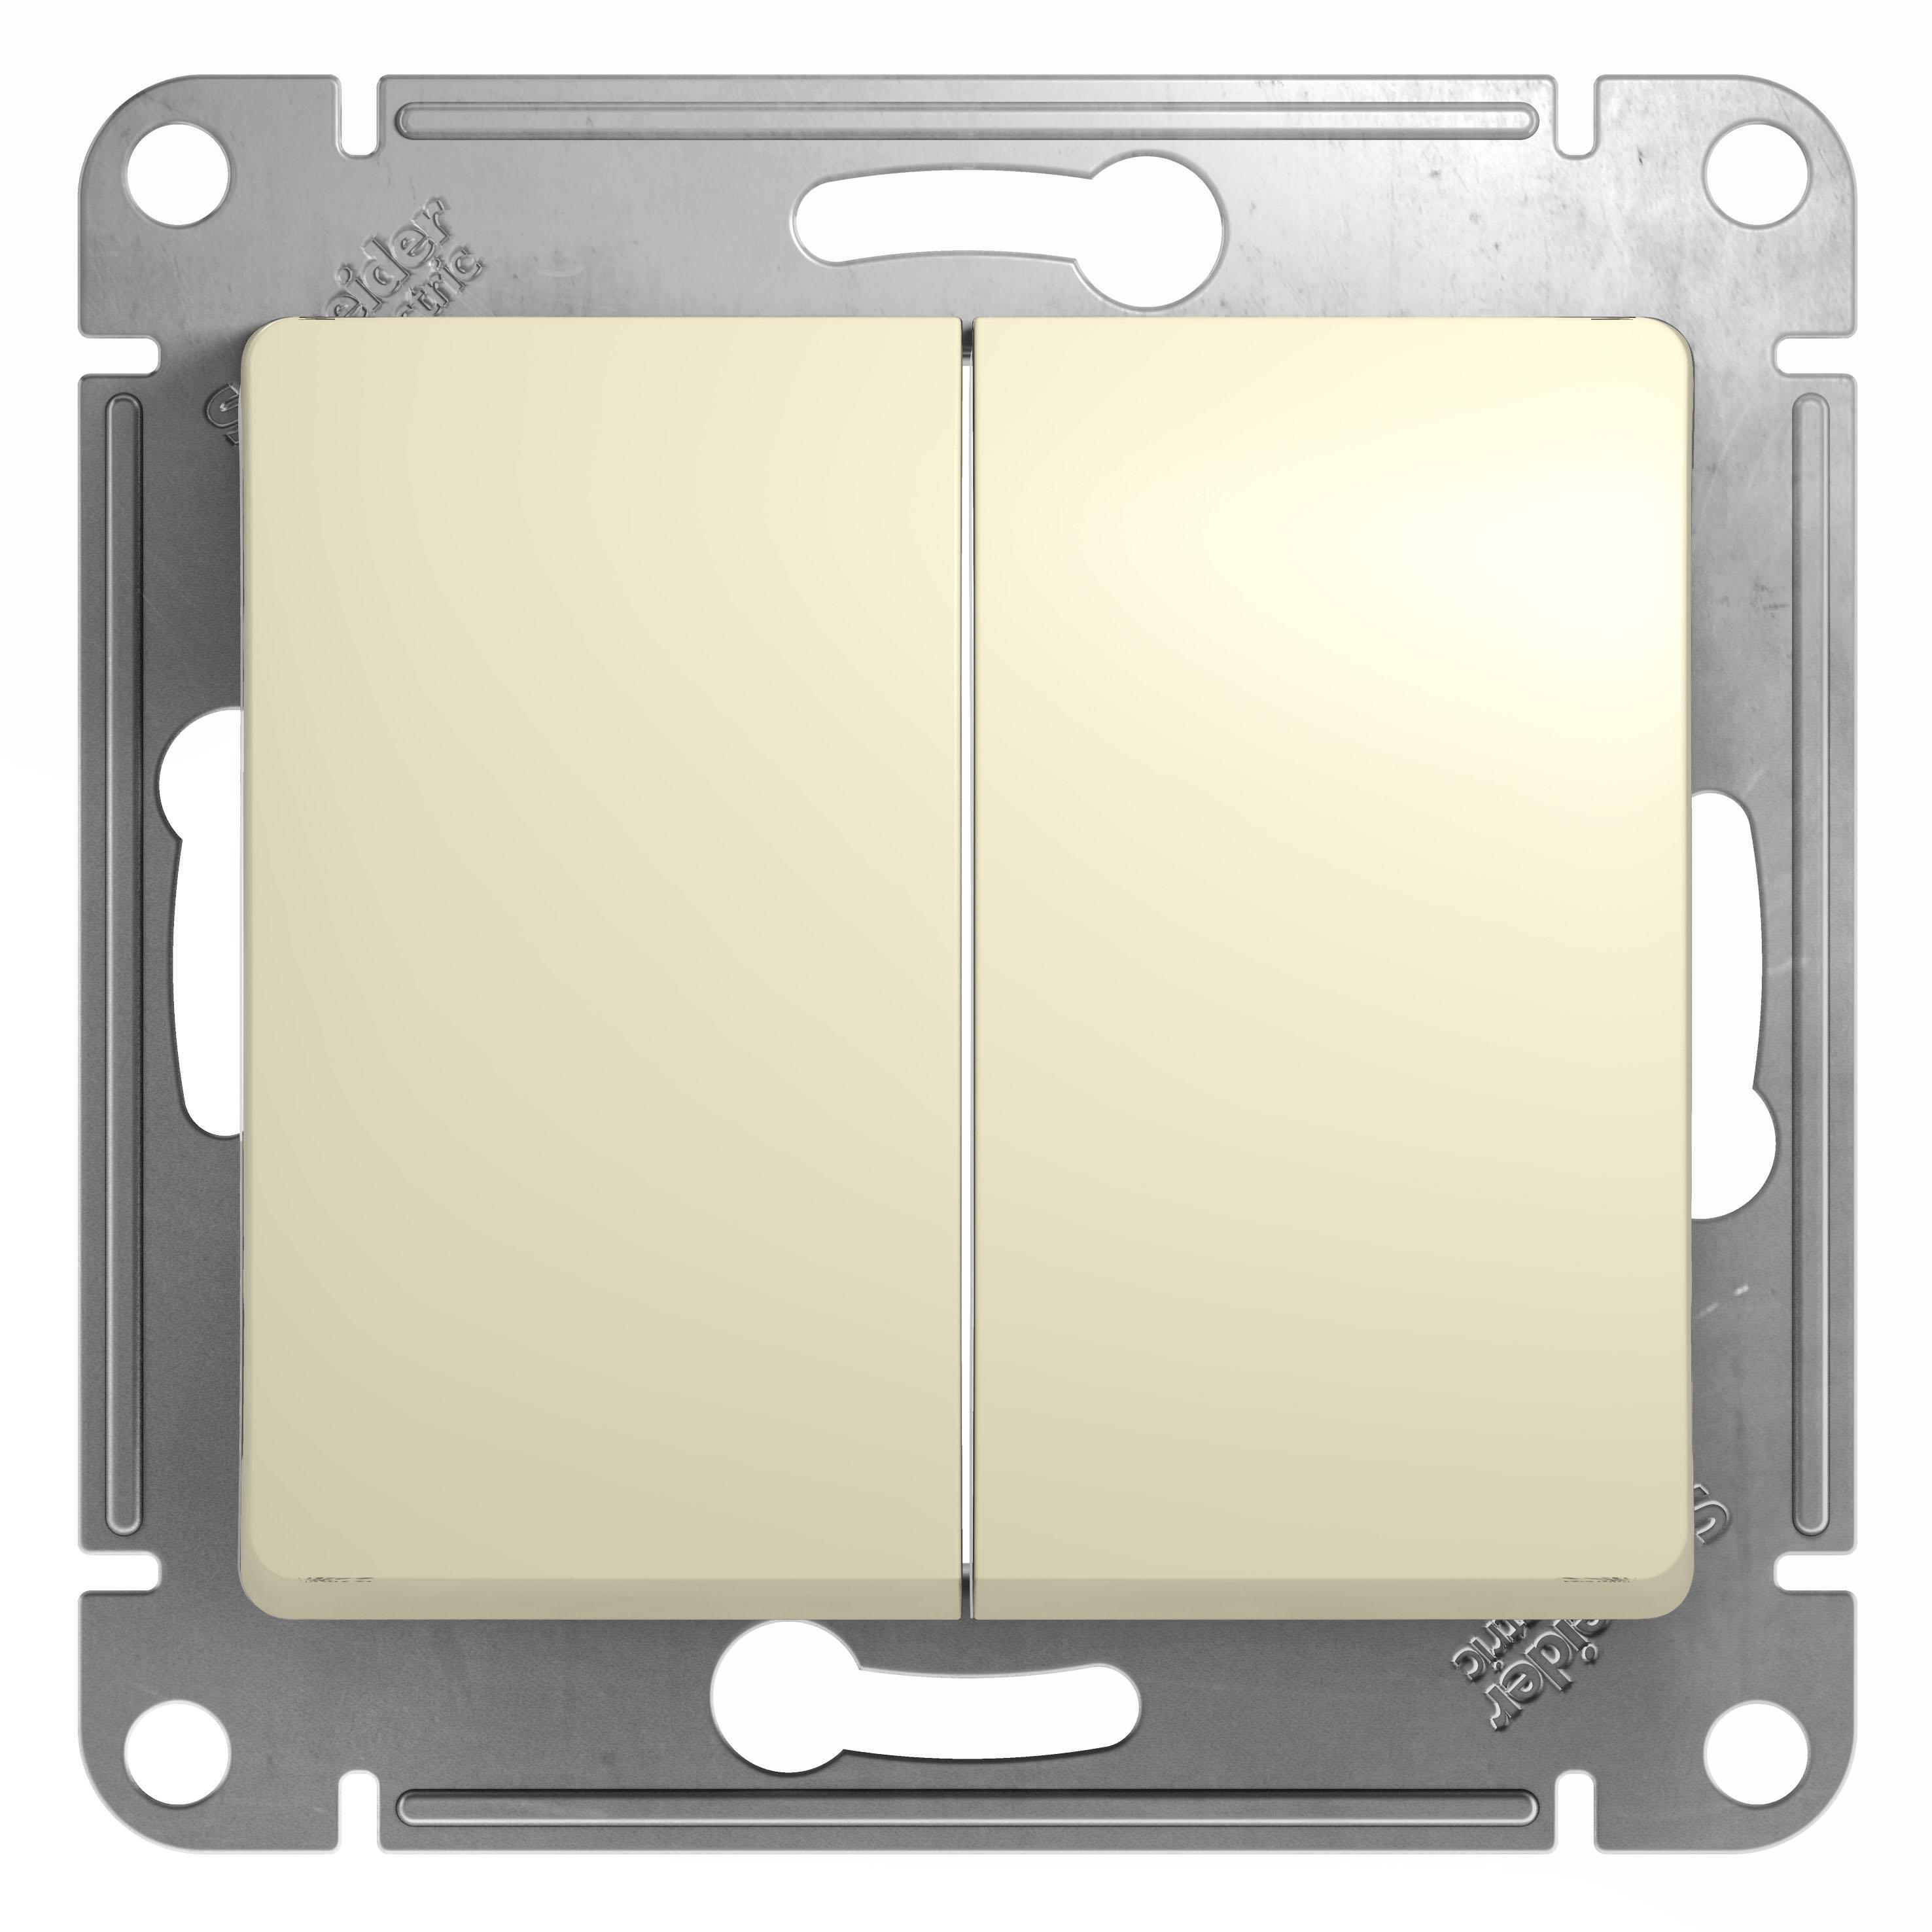 Механизм выключателя Schneider electric Gsl000251 glossa рамка schneider electric glossa 1063724